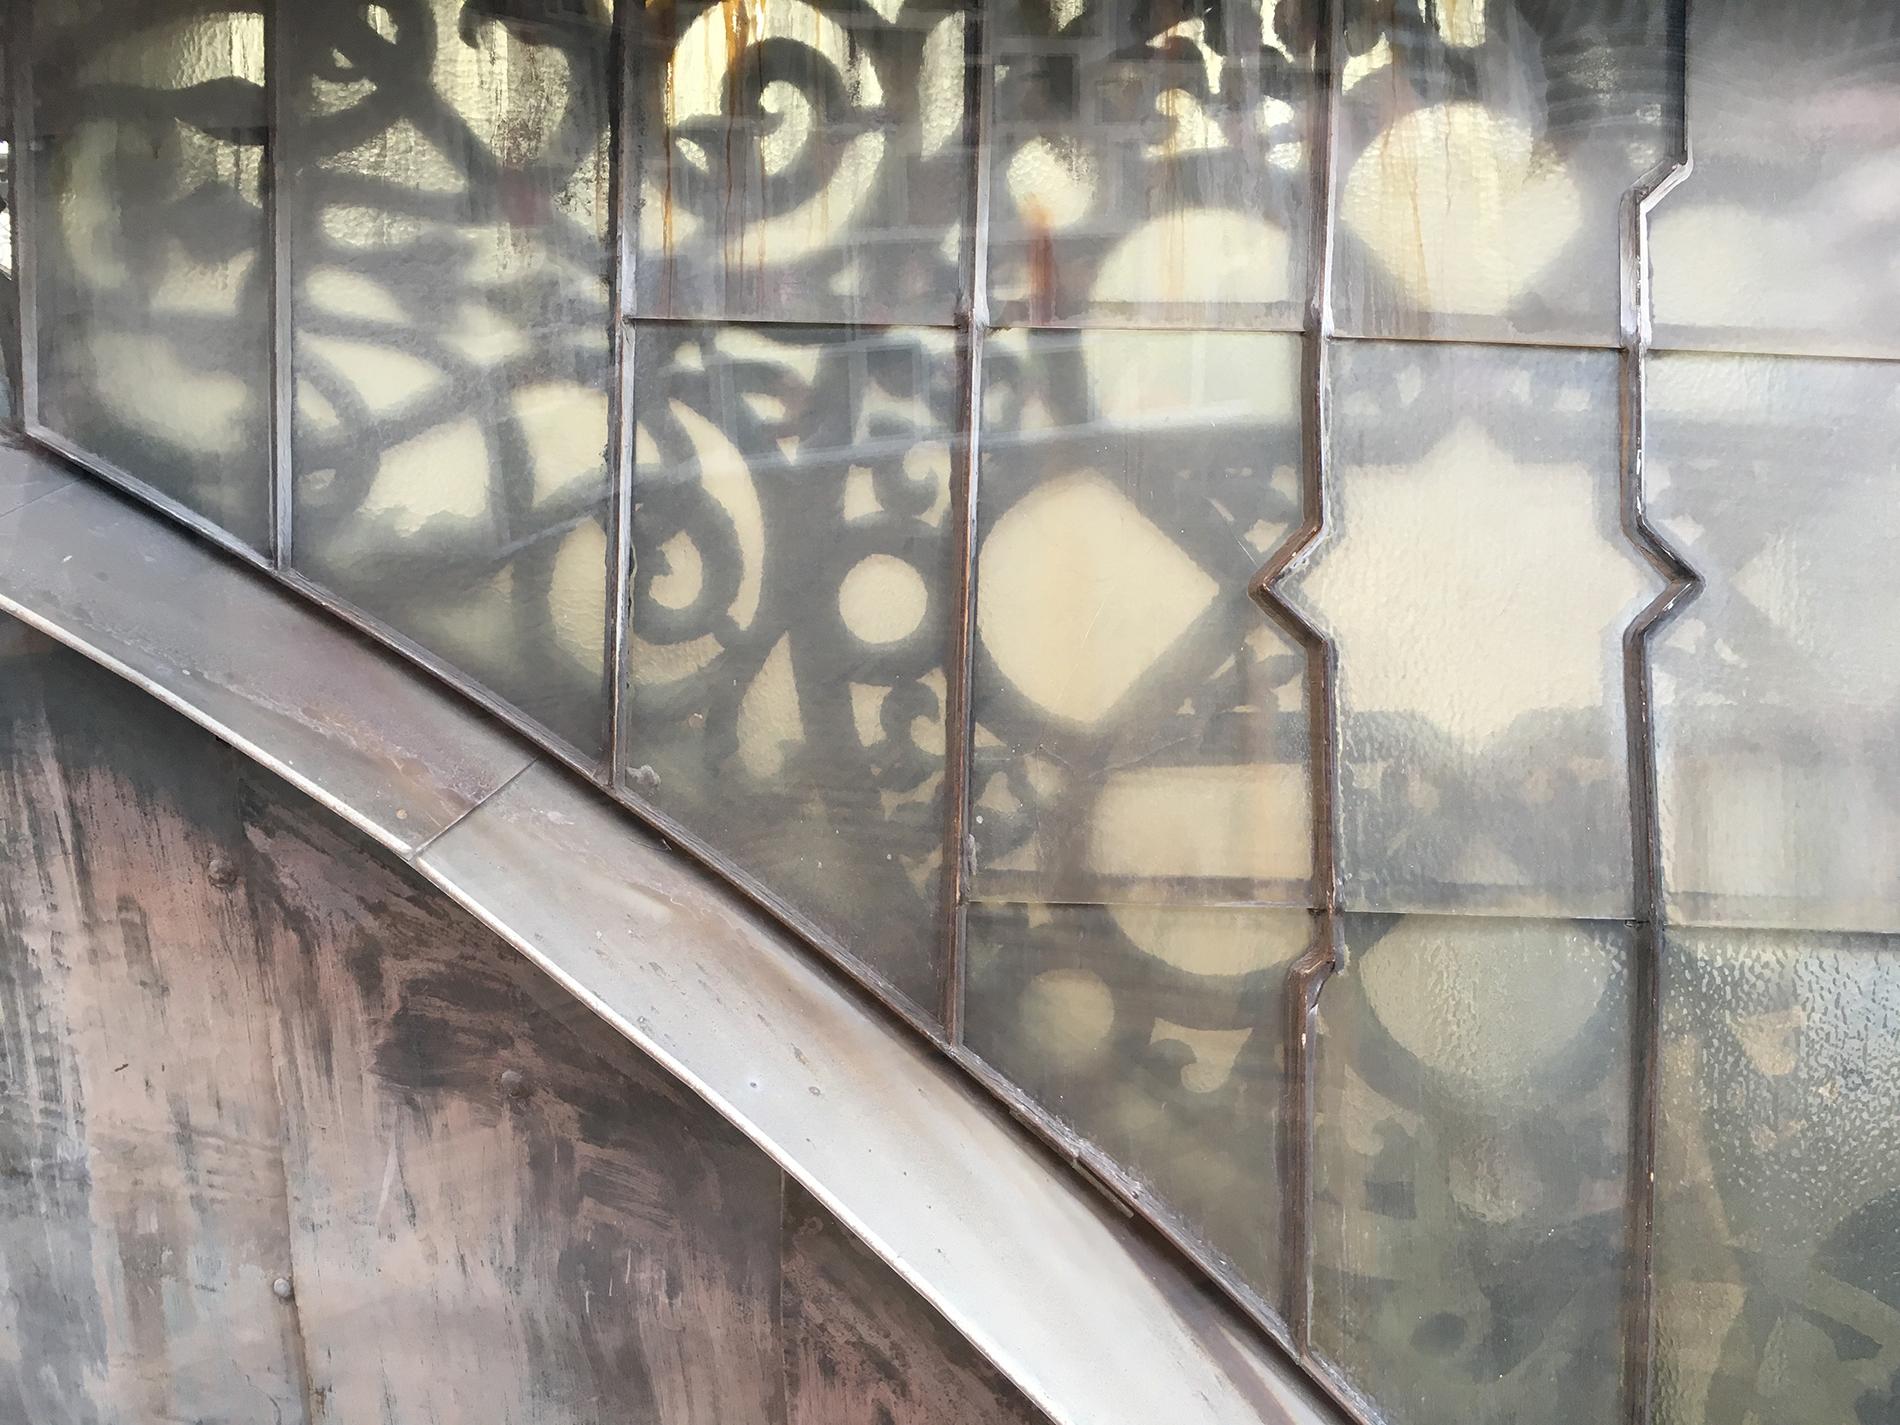 Fondazione Prada Osservatorio, view of the space (Foto: Barbara Fässler)